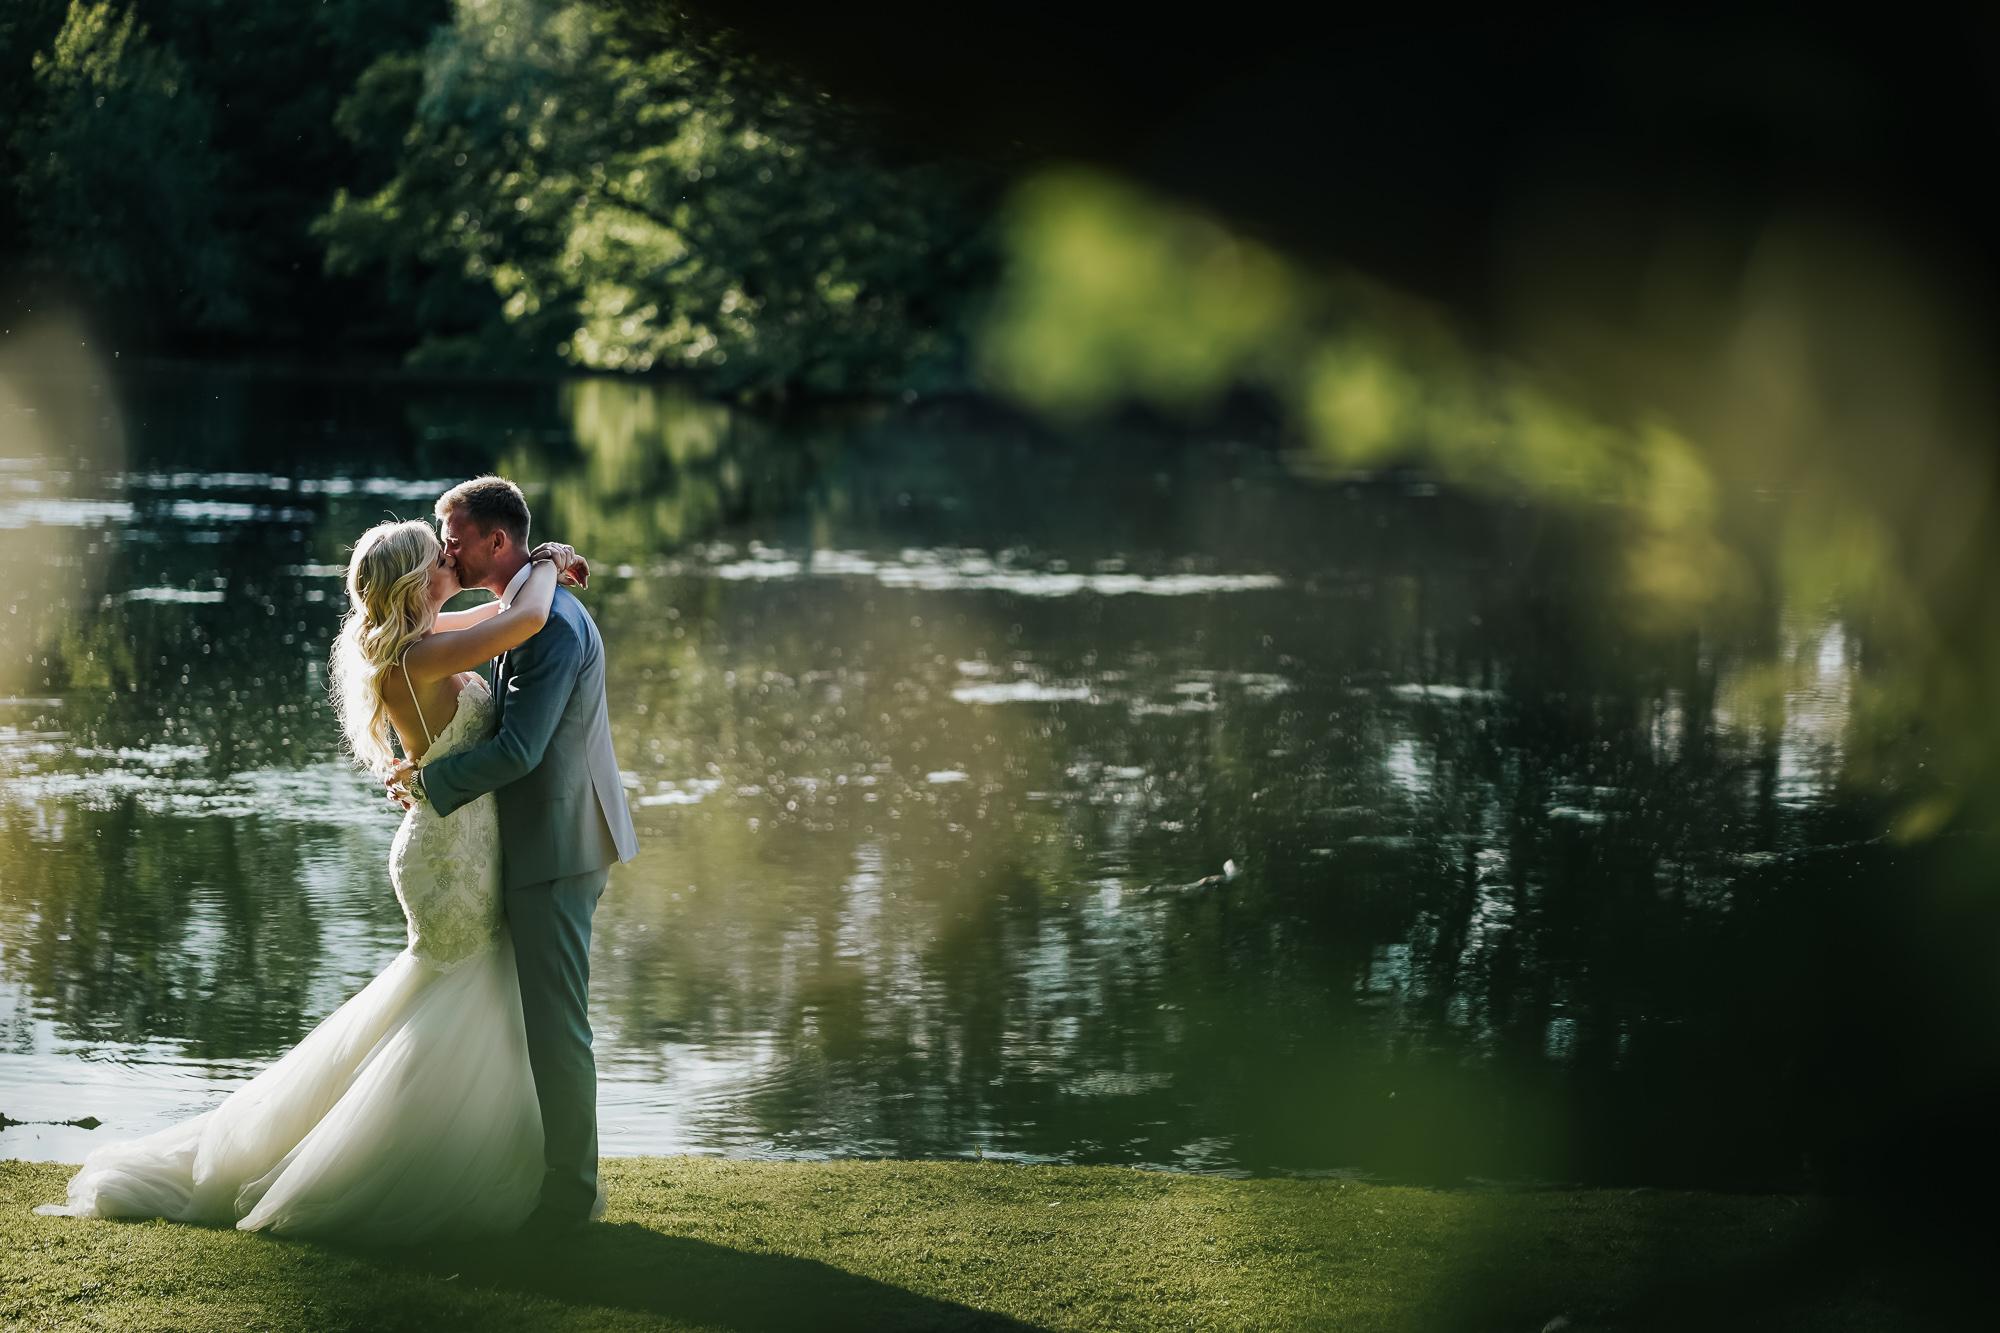 Thornton Manor Lakeside Marquee Wedding Photographer  (46 of 53).jpg